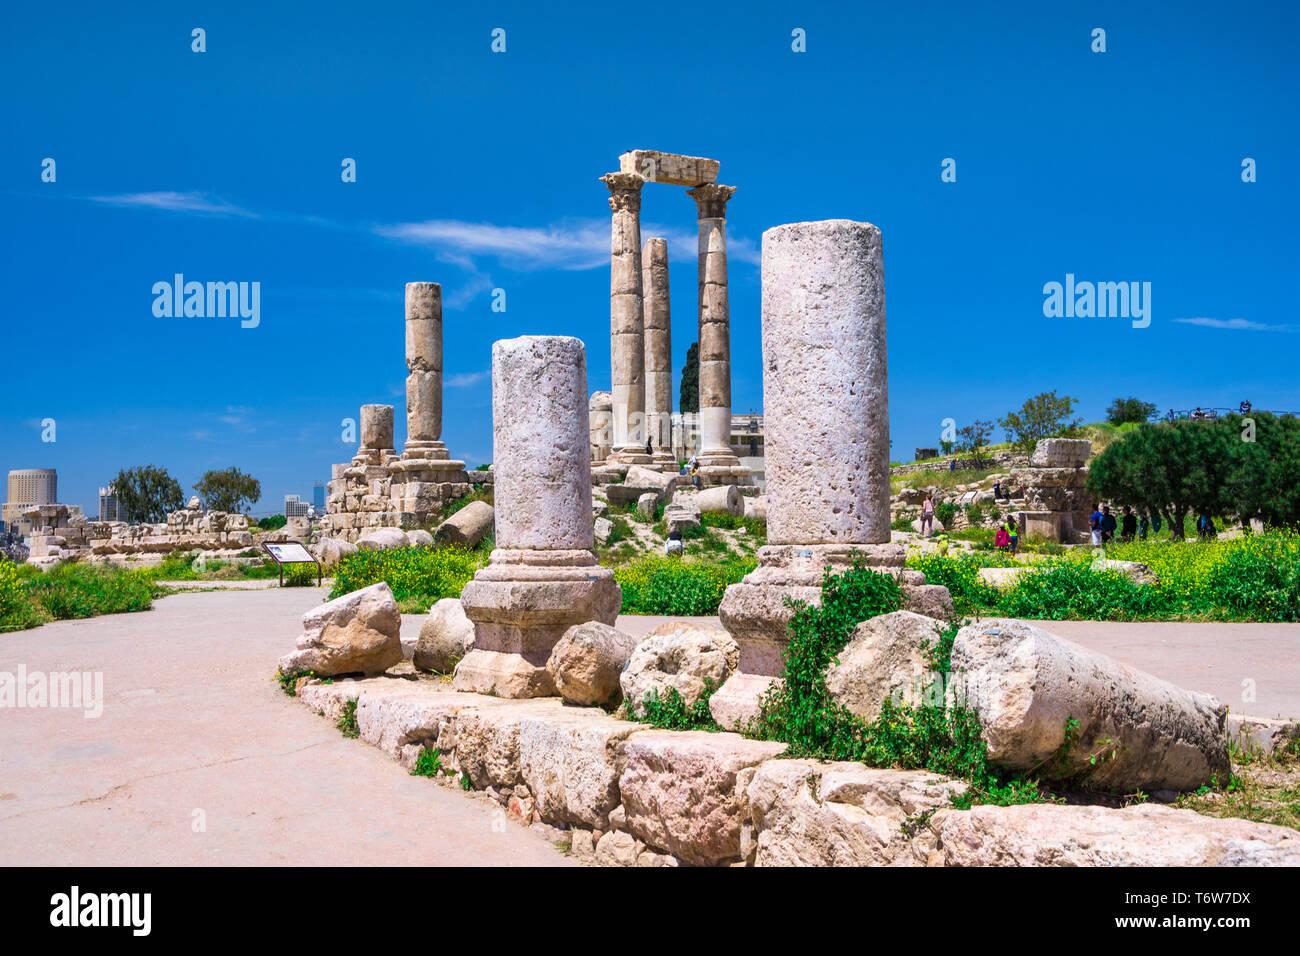 Amman Citadel Hand Stock Photos & Amman Citadel Hand Stock Images